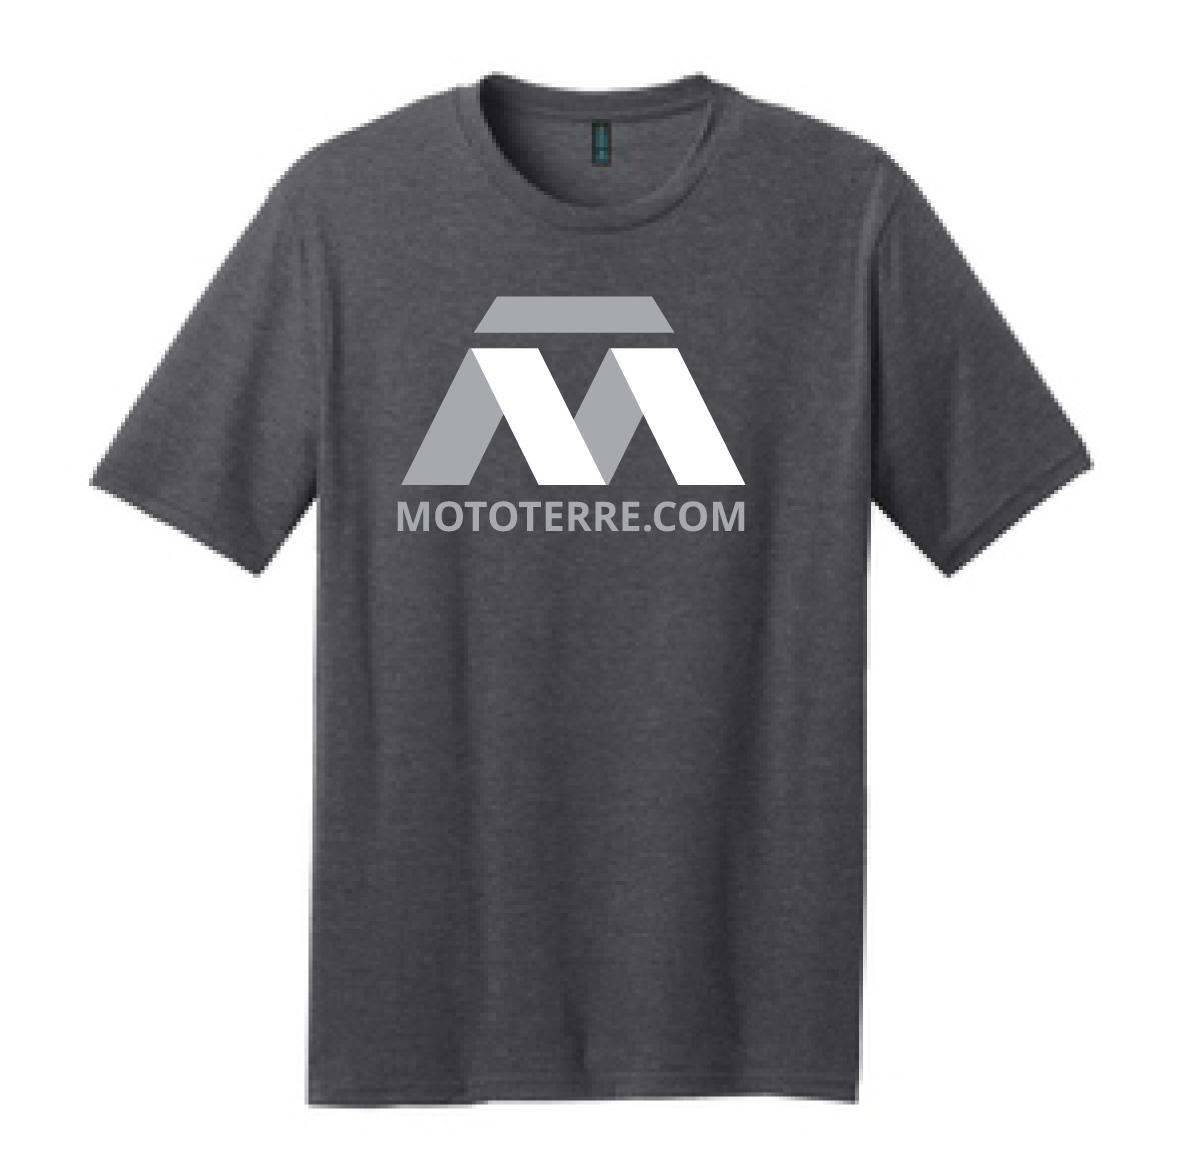 mototerre t shirt